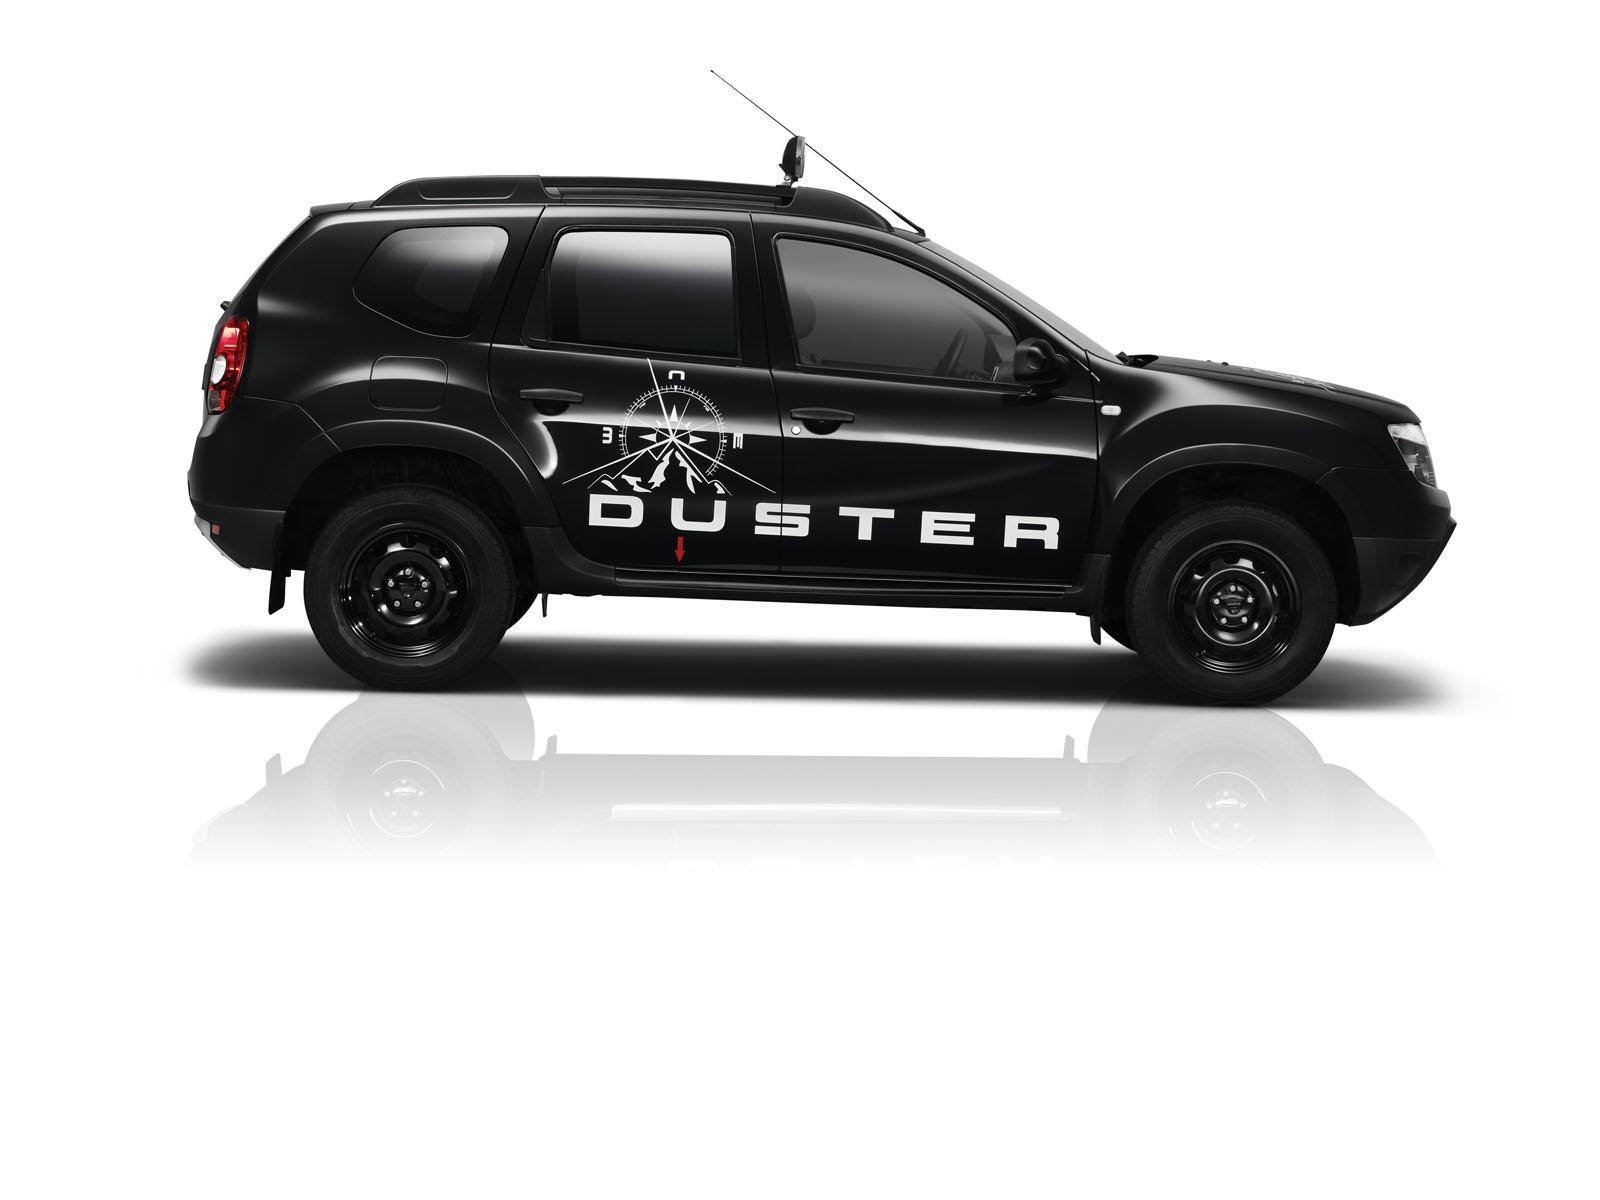 2013 Geneva Motor Show: Dacia Duster Adventure Edition  - фотография №9